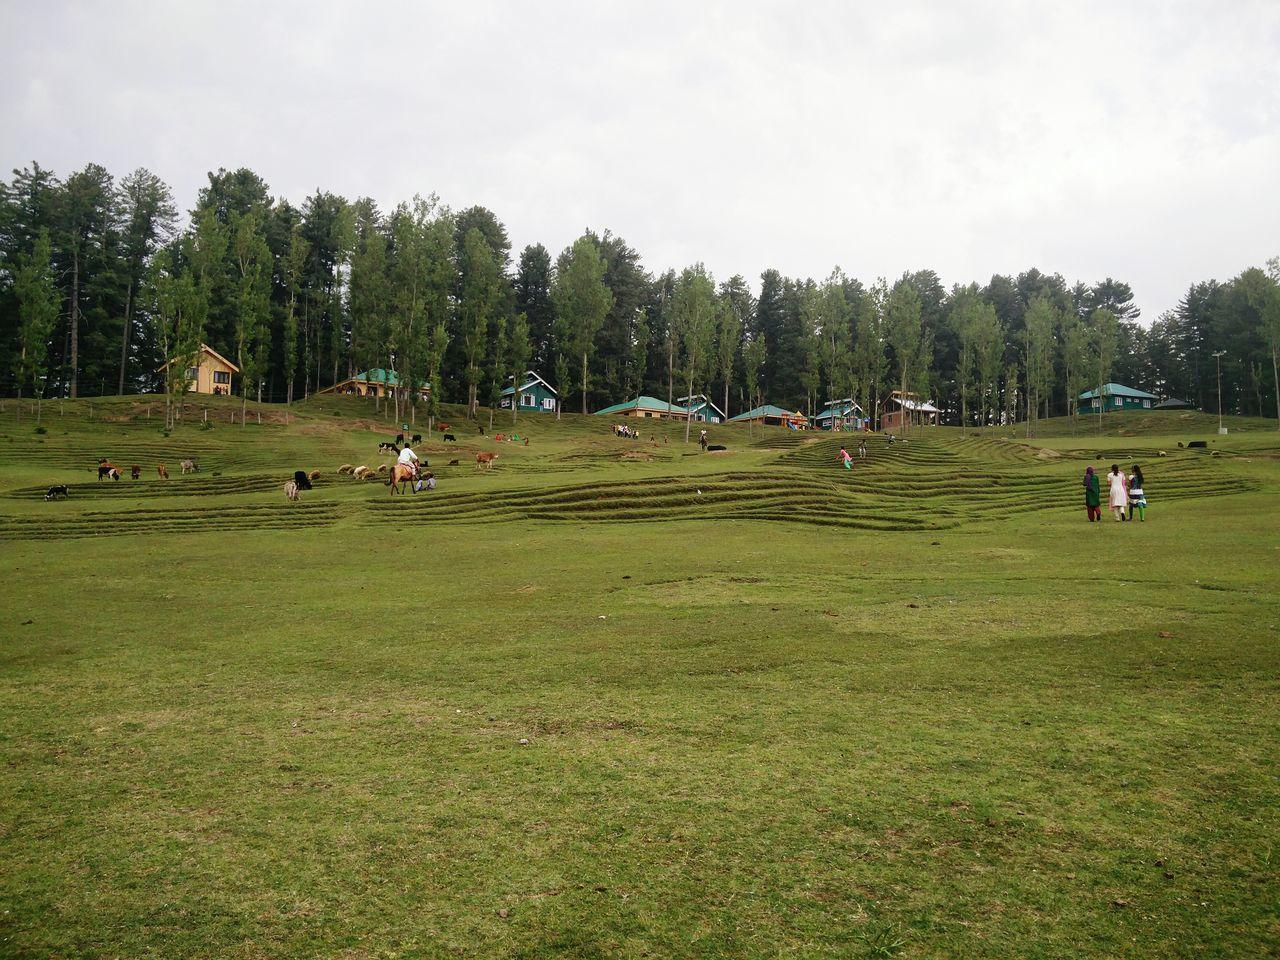 Sanasar, Jammu Sanasar Jammu First Eyeem Photo Nature Photography Scenery Green Nature Meadows Huts Trees